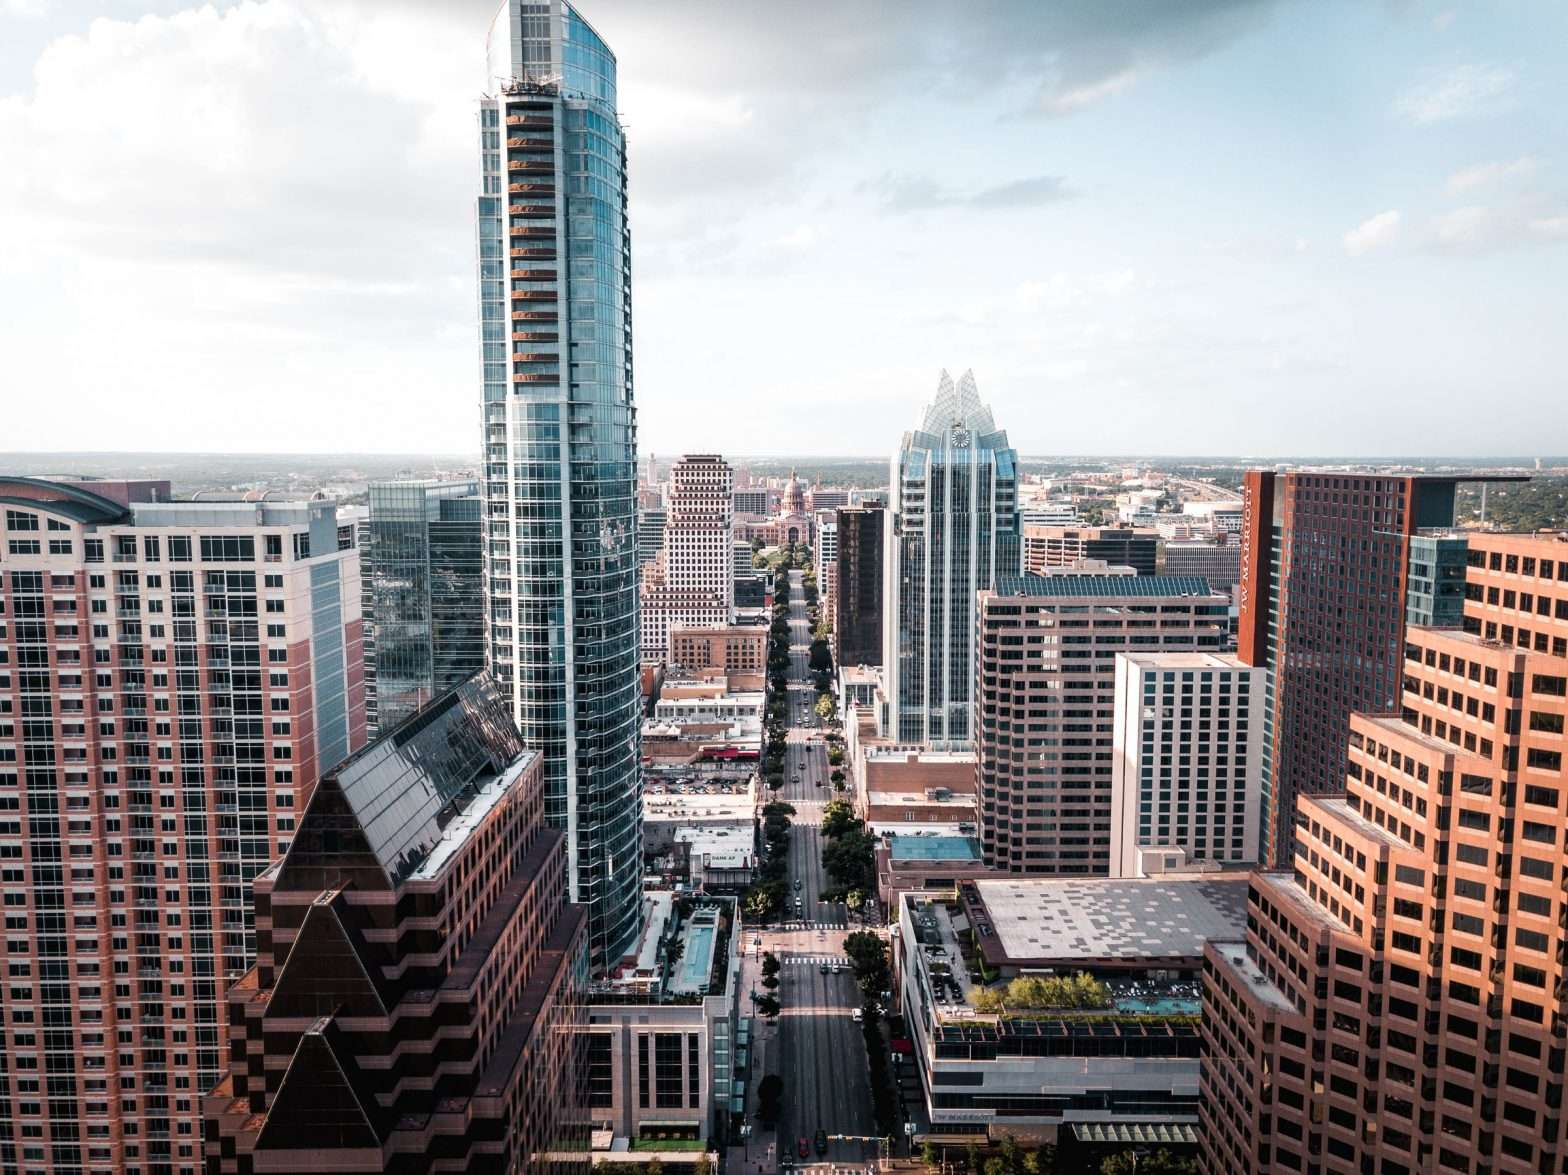 Austin Business District